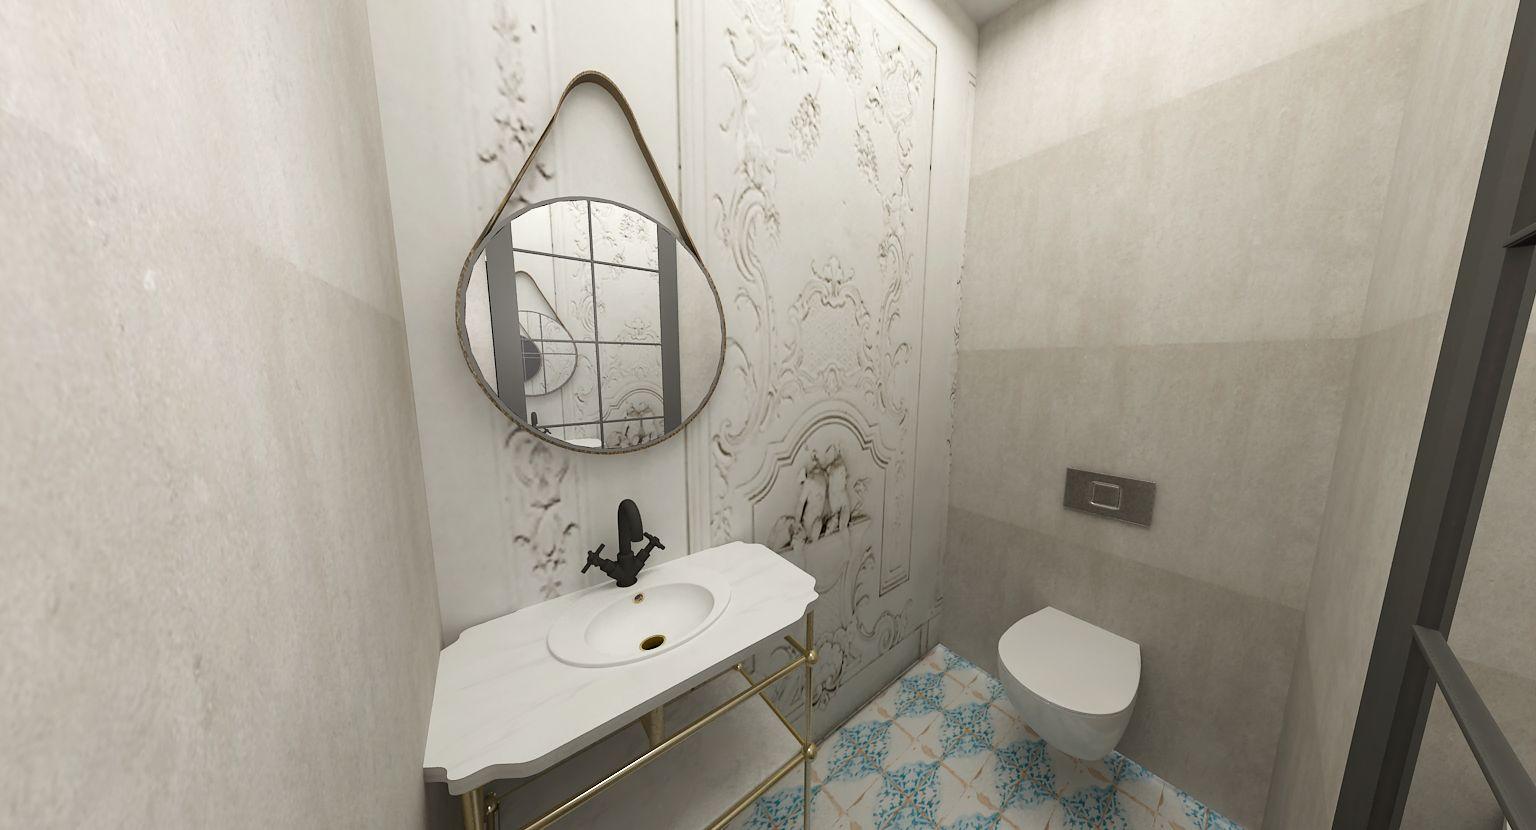 Original modern style bathroom wc design by rusudan tumanaishvili